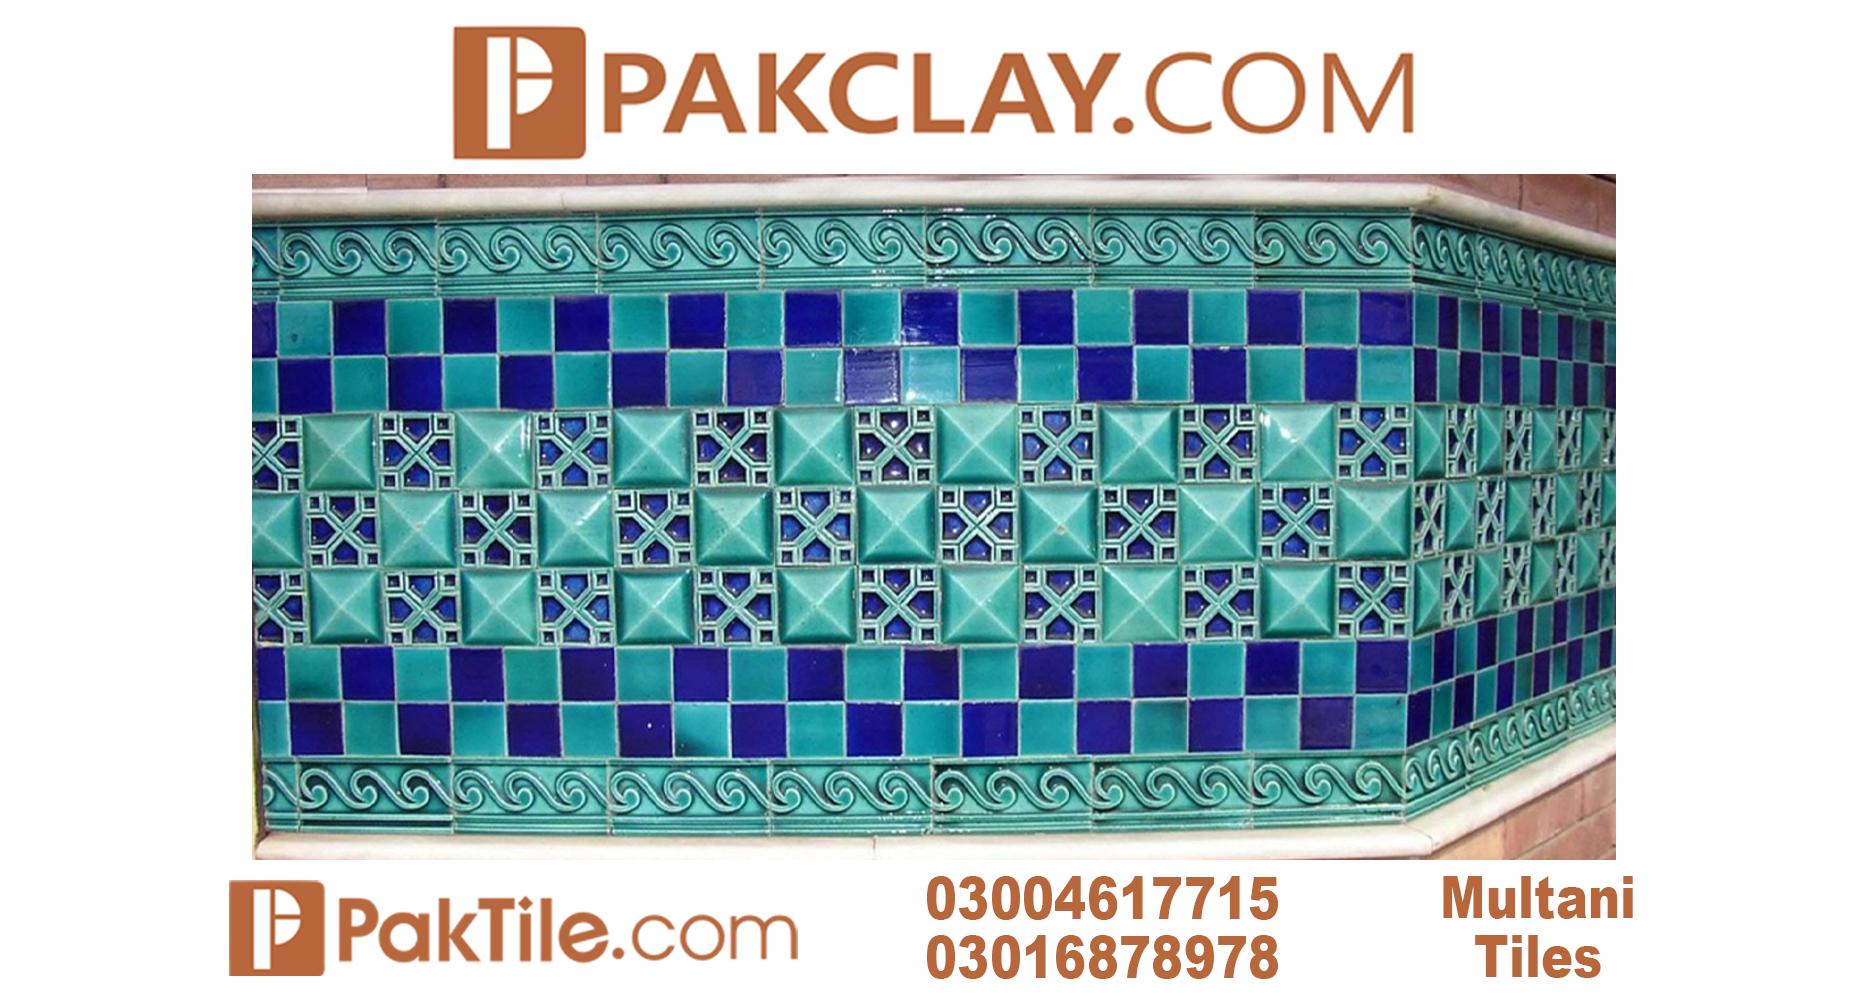 21 Multani Tiles Price in Pakistan